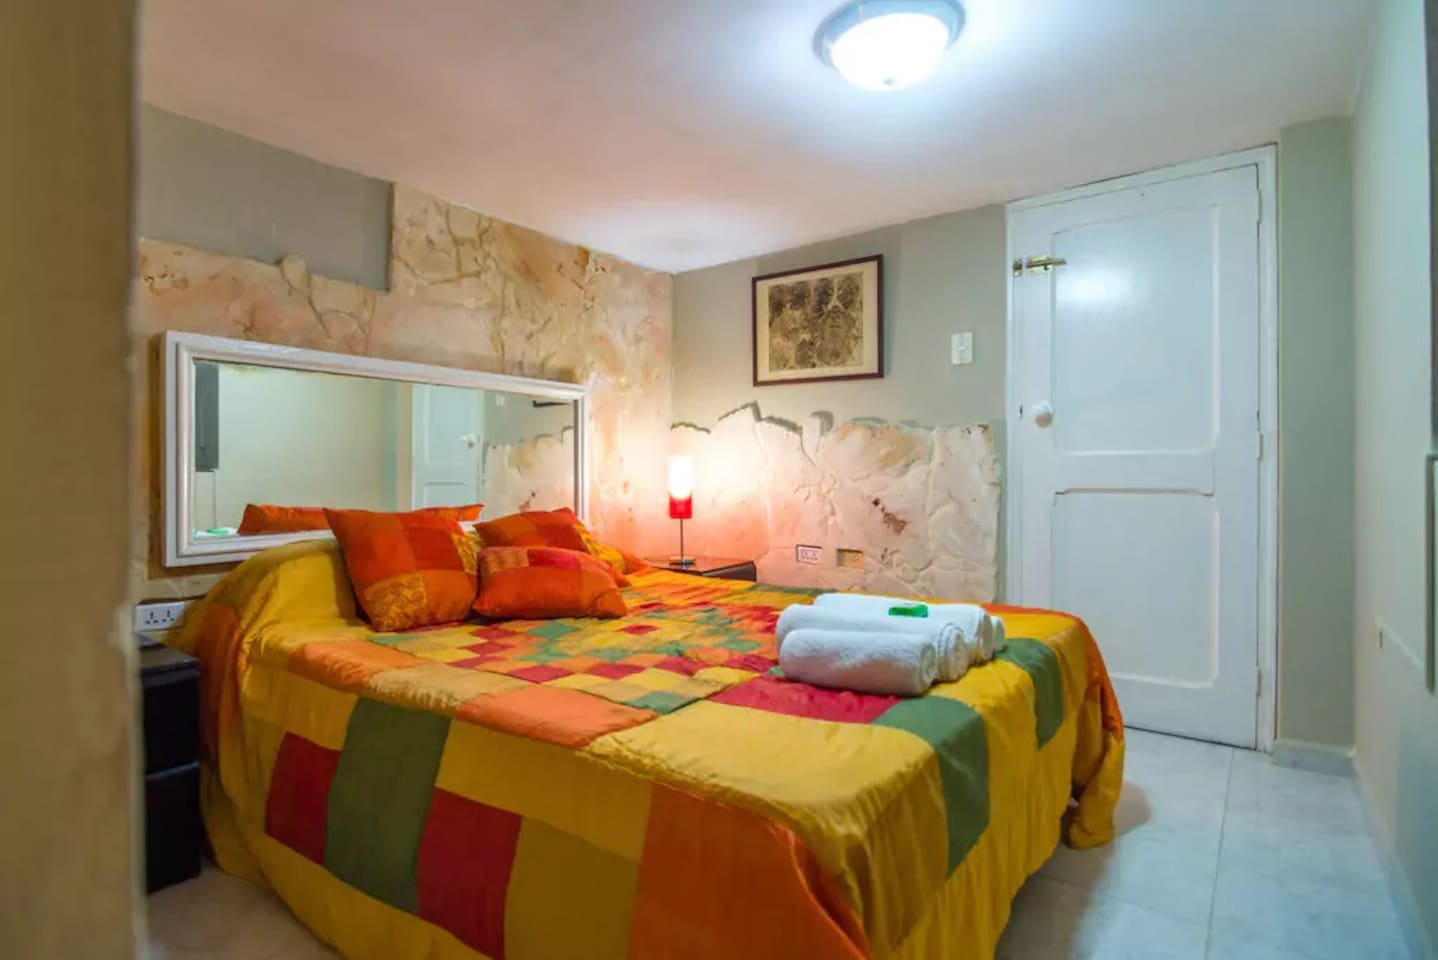 Apartment Villa Don Teto Suite   8 Rooms  Great Havana View photo 26030649